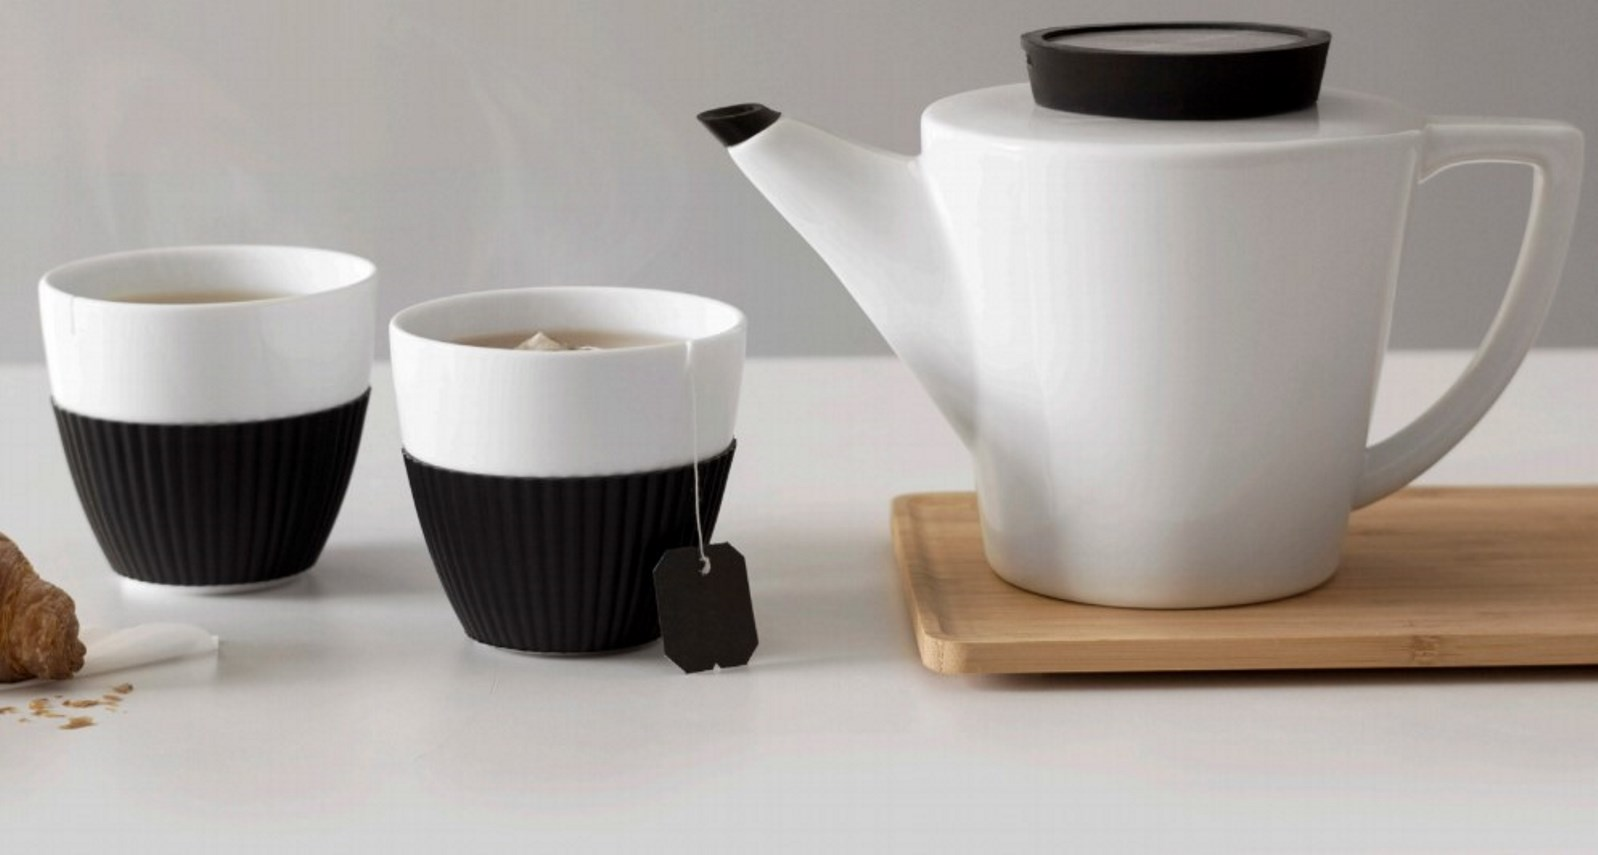 Чайный набор: чайник и 2 чашки Viva Scandinavia INFUSION, объем: 1 л/0,25 л, бежевый, 3 предмета Viva Scandinavia V24121 фото 4